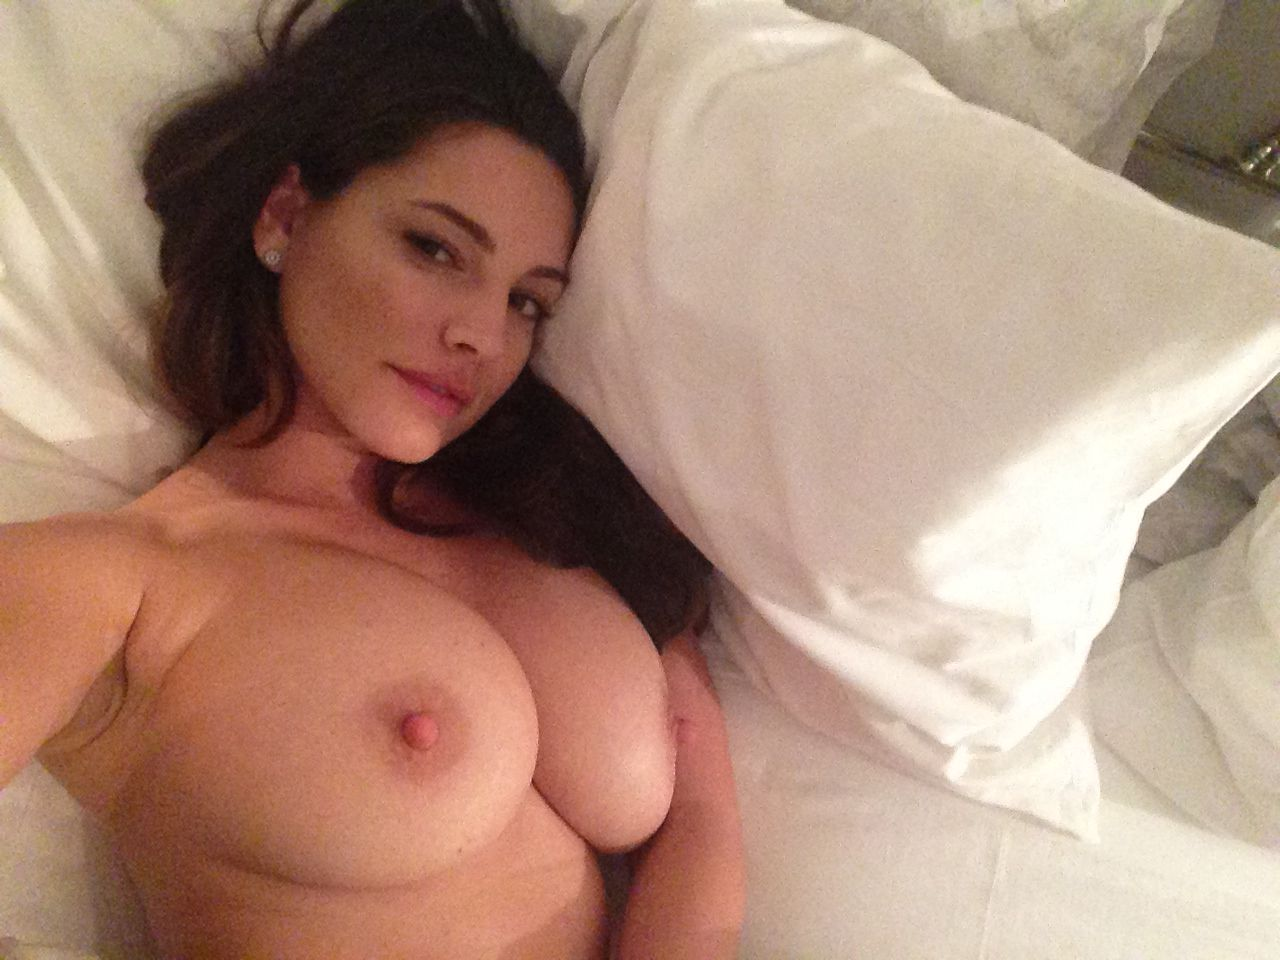 Jason Statham's ex-girlfriend Kelly Brook naked